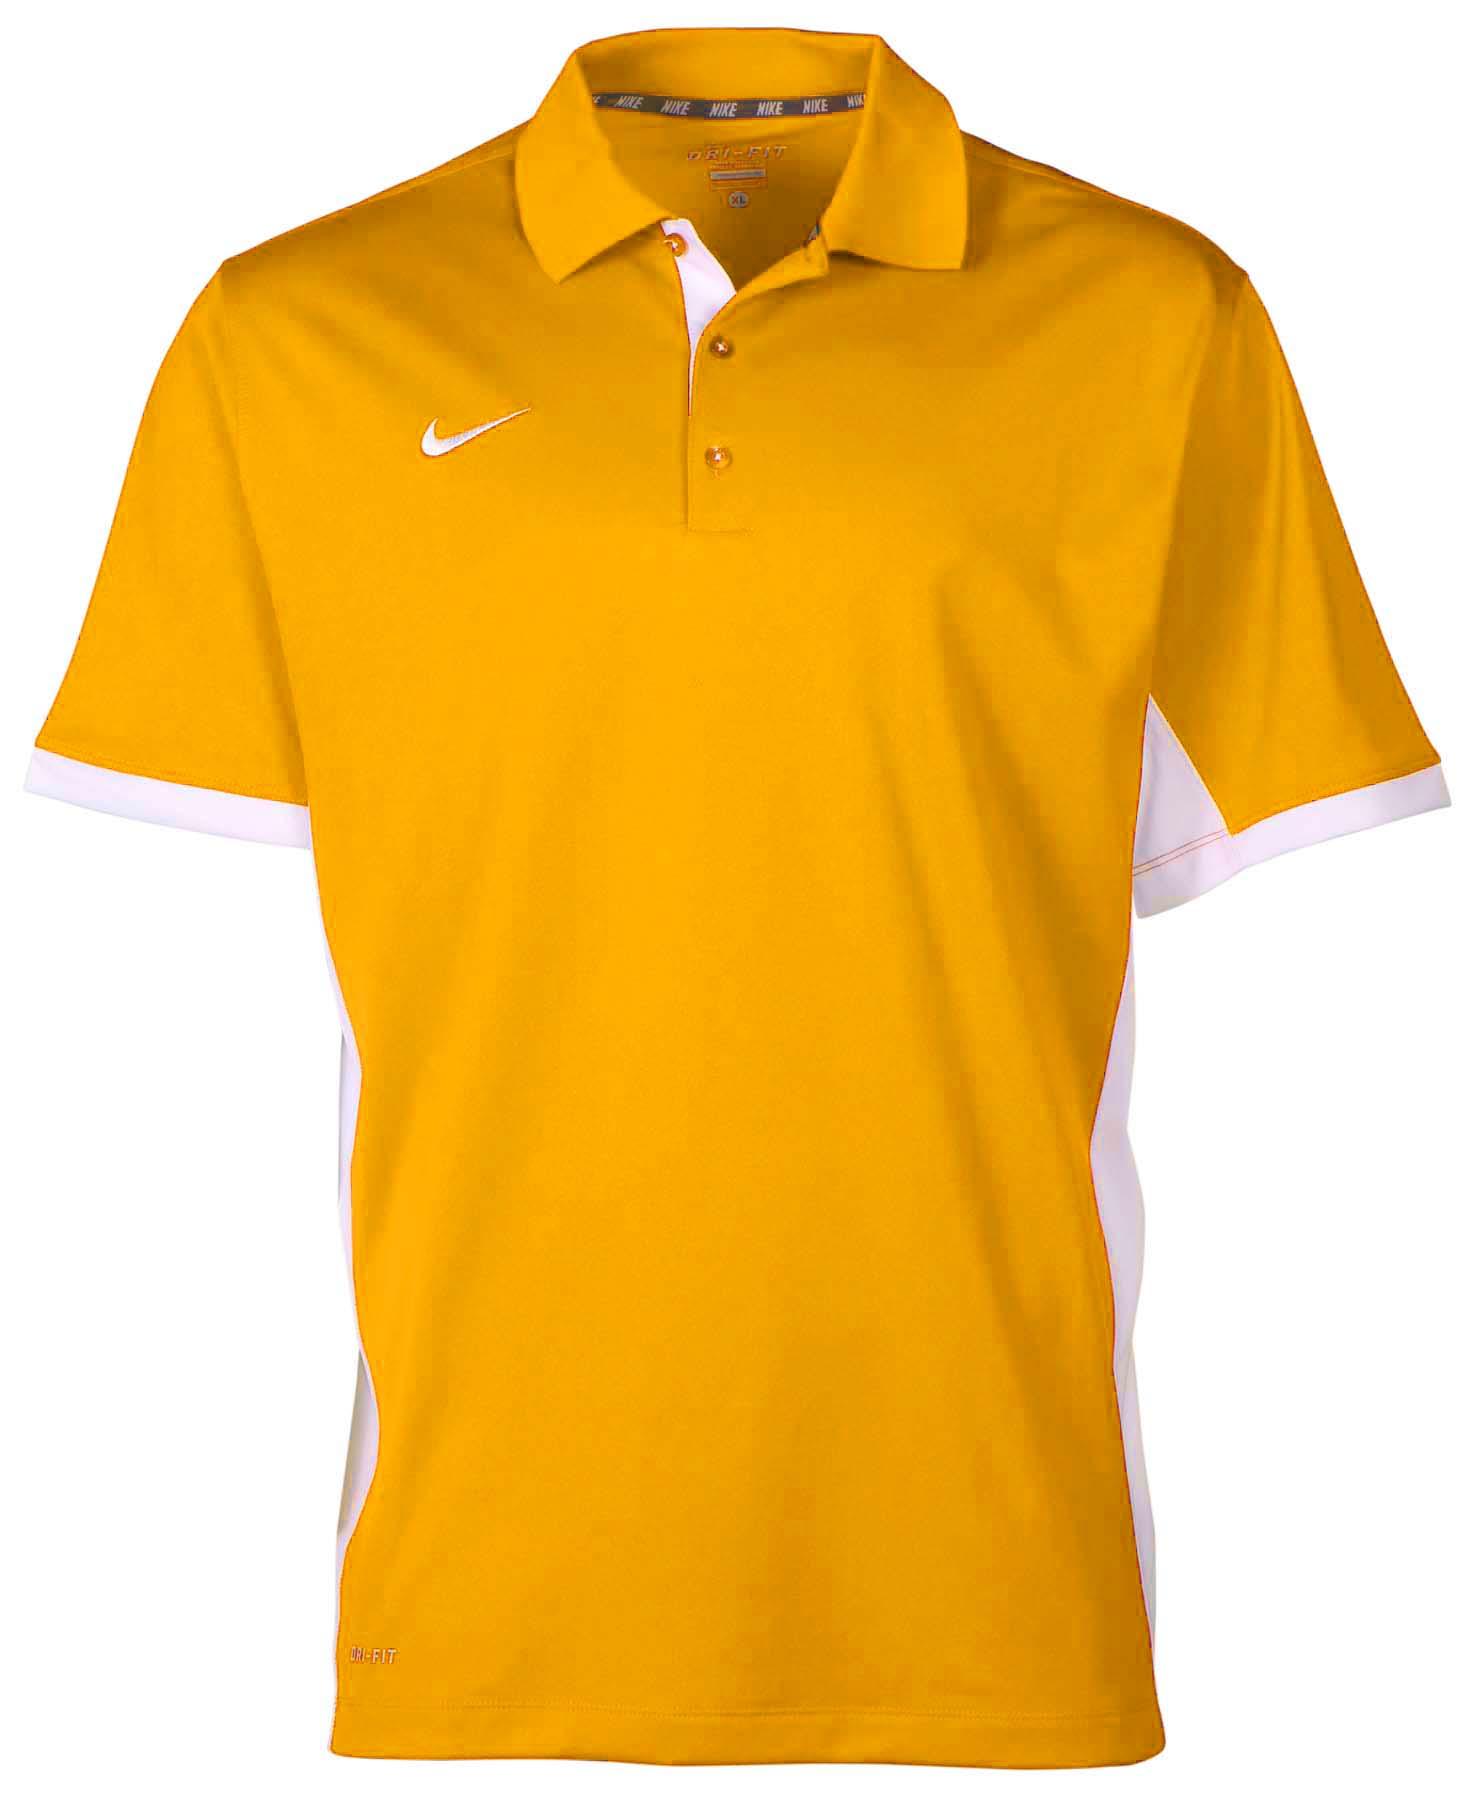 Nike men 39 s dri fit performance sideline polo shirt ebay for Men s performance polo shirts